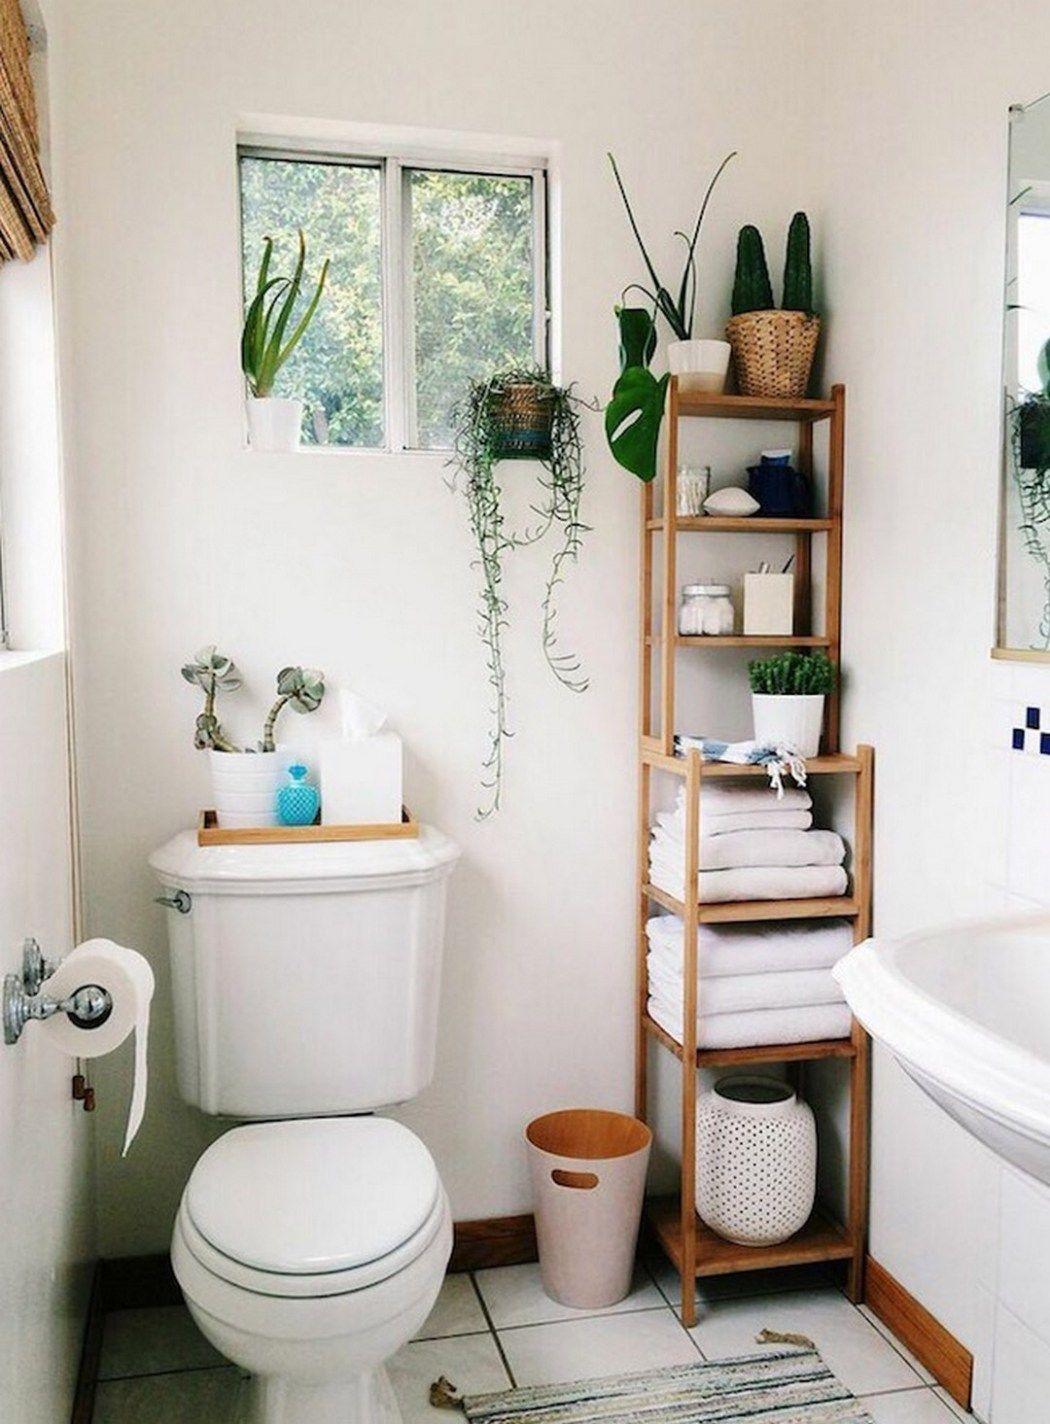 66 quick and easy bathroom storage and organization tips la casita rh pinterest com